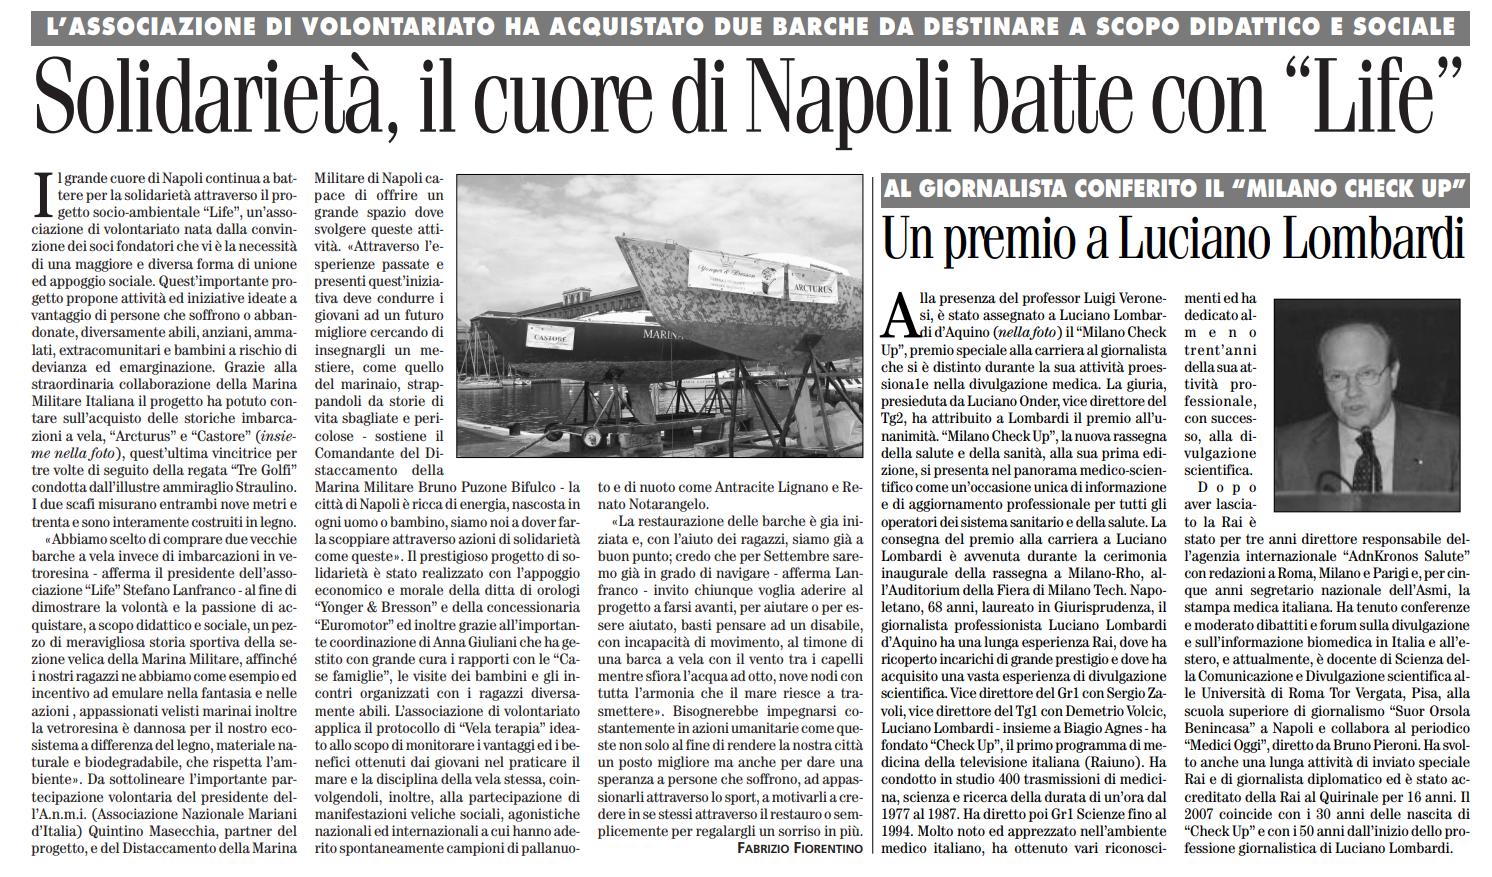 rassegna stampa associazione life onlus - roma